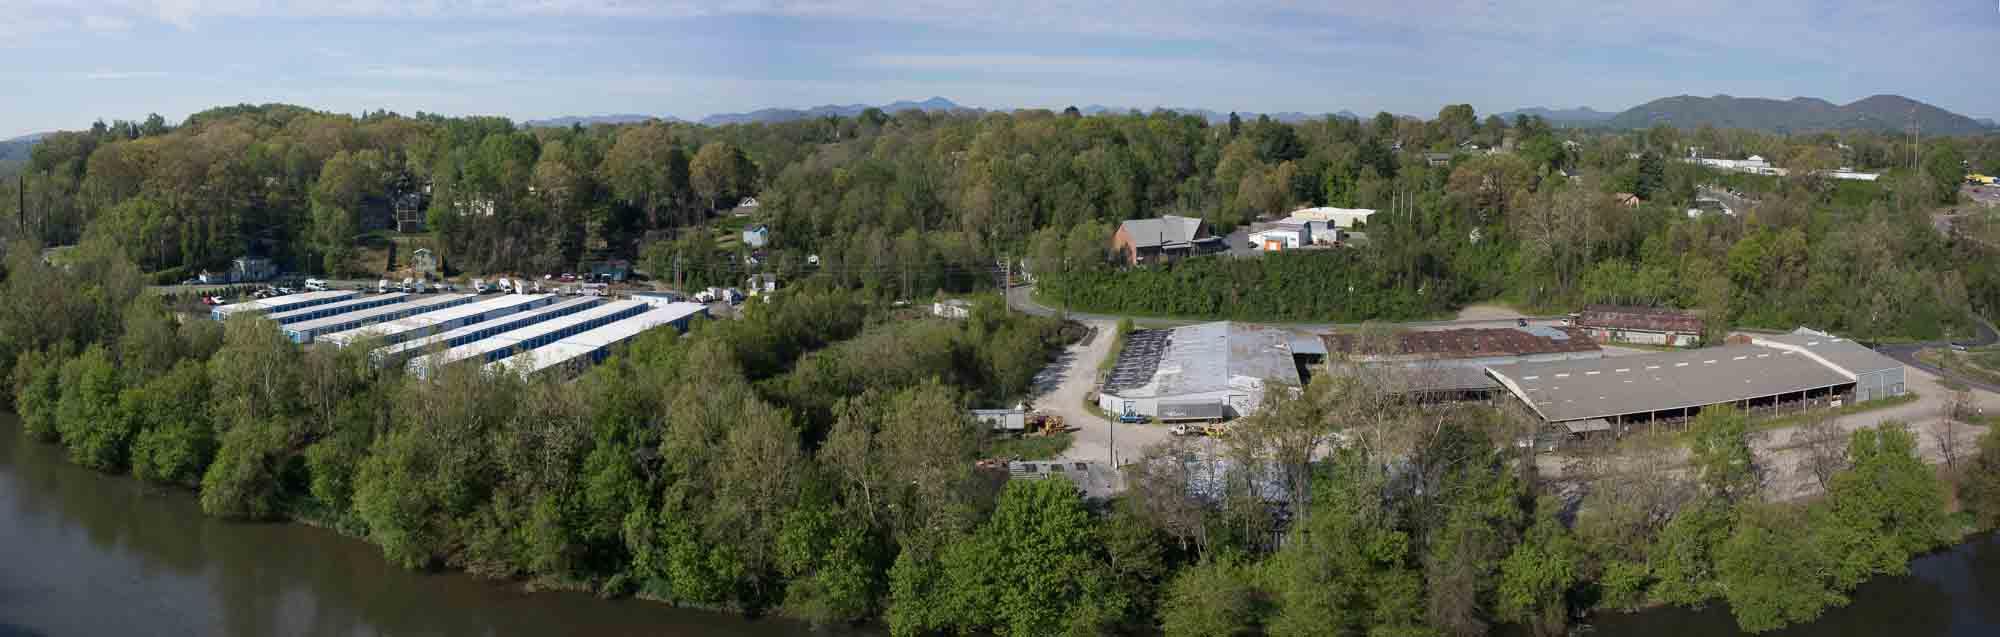 stockyards01.jpg